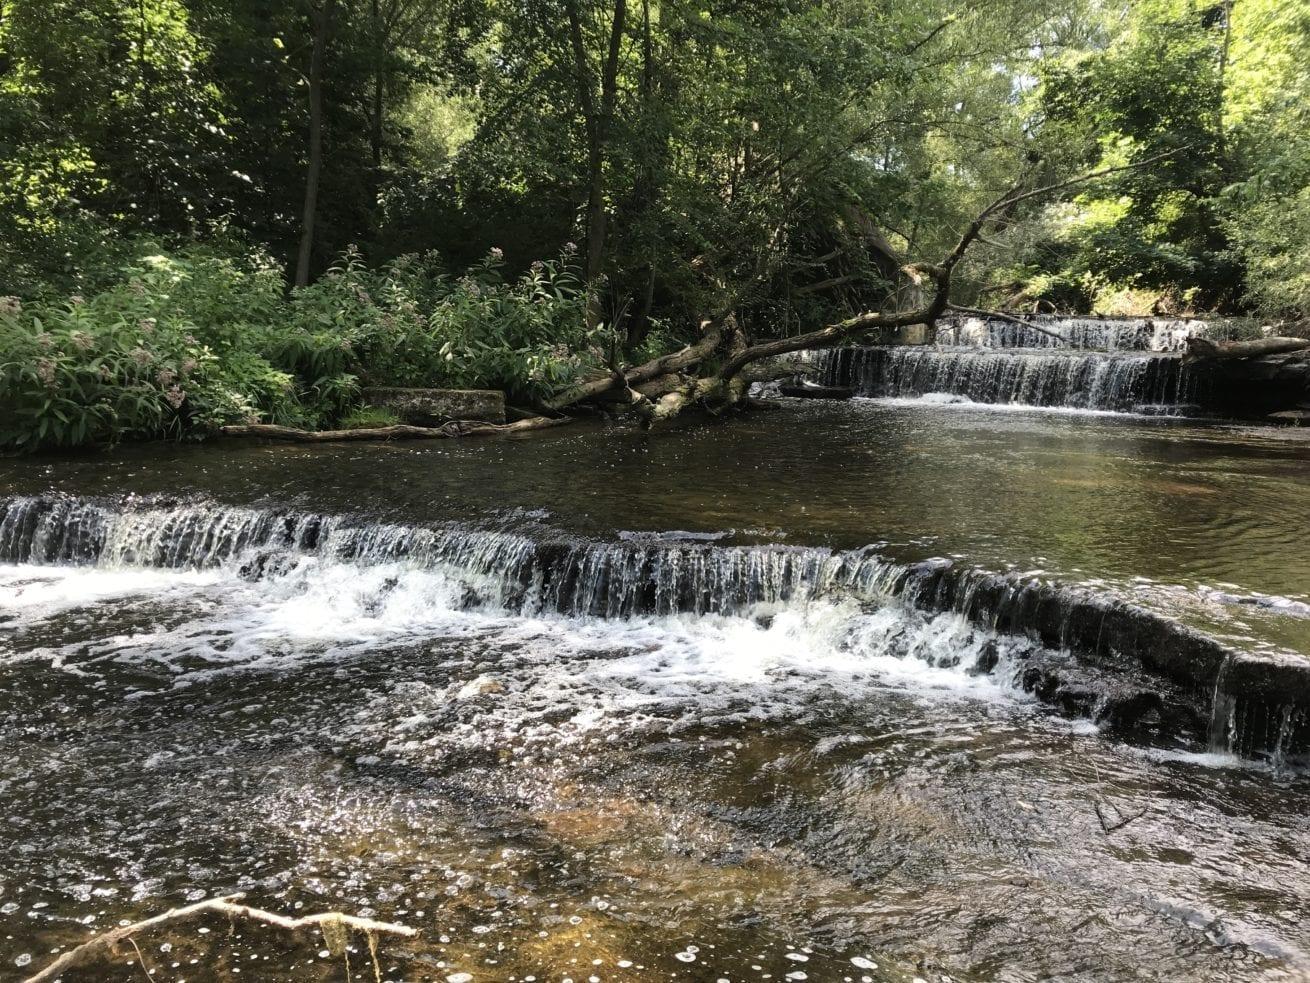 Maxwell Creek Falls, Wayne County, New York Aug 2019